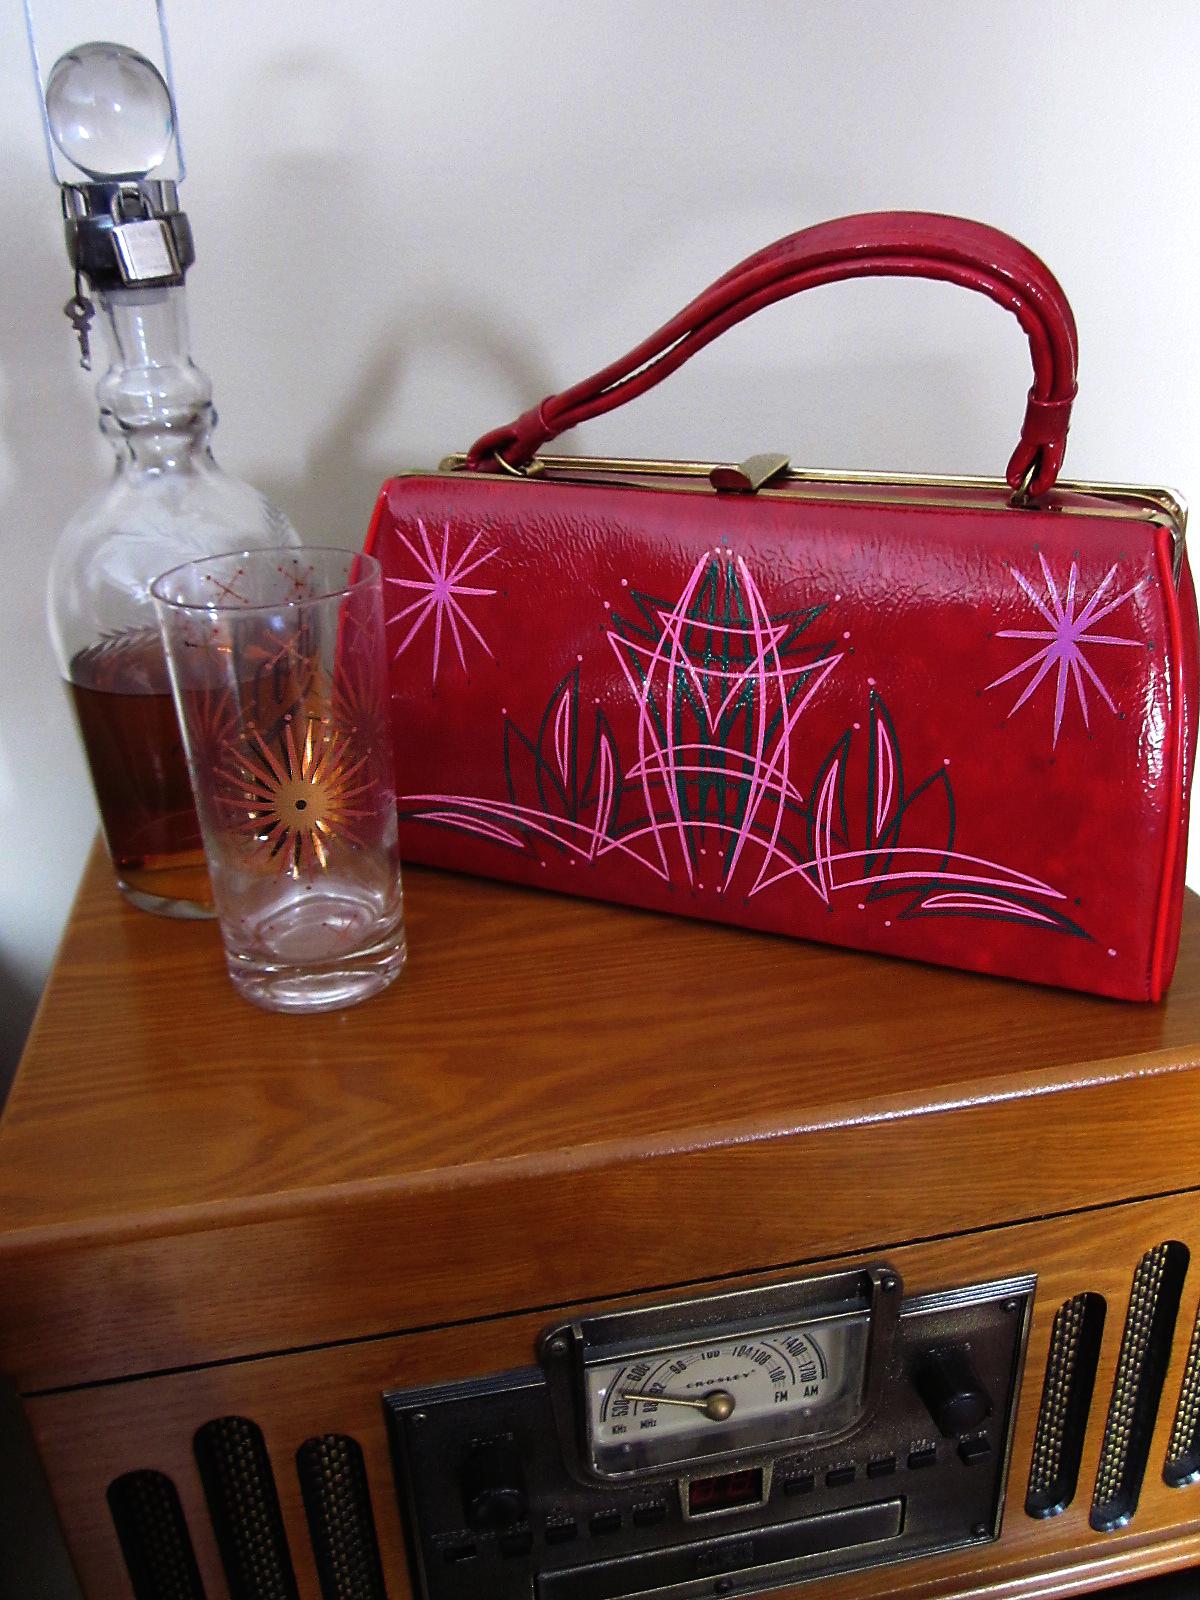 grease and grace, gallery, art for sale, artist, art online, art sites, handbags, leather handbags, bakelite handbags, acrylic handbags, purse, leather bags, leather purses, patent leather purses, vintage handbag, ladies handbag, handbags on sale, vintage purses, designer purses, vintage style handbags, vintage handbags for sale, vintage looking handbags, handbag vintage, vintage clutch, evening clutches, patent leather clutch, large clutch bags, vintage purses, vintage box purse, vintage purses online, vintage bags and purses, vintage purses and handbags, retro handbags, retro bags, retro purses, retro leather bags, retro wallet, black bag, women's black bag, bags for sale, bags on sale, unique purses, unique leather purses, unique purses for sale, navy clutch bag, white clutch, handbags online, handbags etsy, red clutch, evening purse, evening clutch purse, black evening purse, 1950s purse, 1950s handbag, 1960s purse, 1960s handbag, 1940s purse, 1940s handbag, rockabilly, vintage, purse, fashion, style, burlesque, retro, 60s, vinyl, 50s, fifties, 1960s, 1950s, handbag, purses, pocketbook, pinstripe, pin striped, pin-stripe, pin-striper,